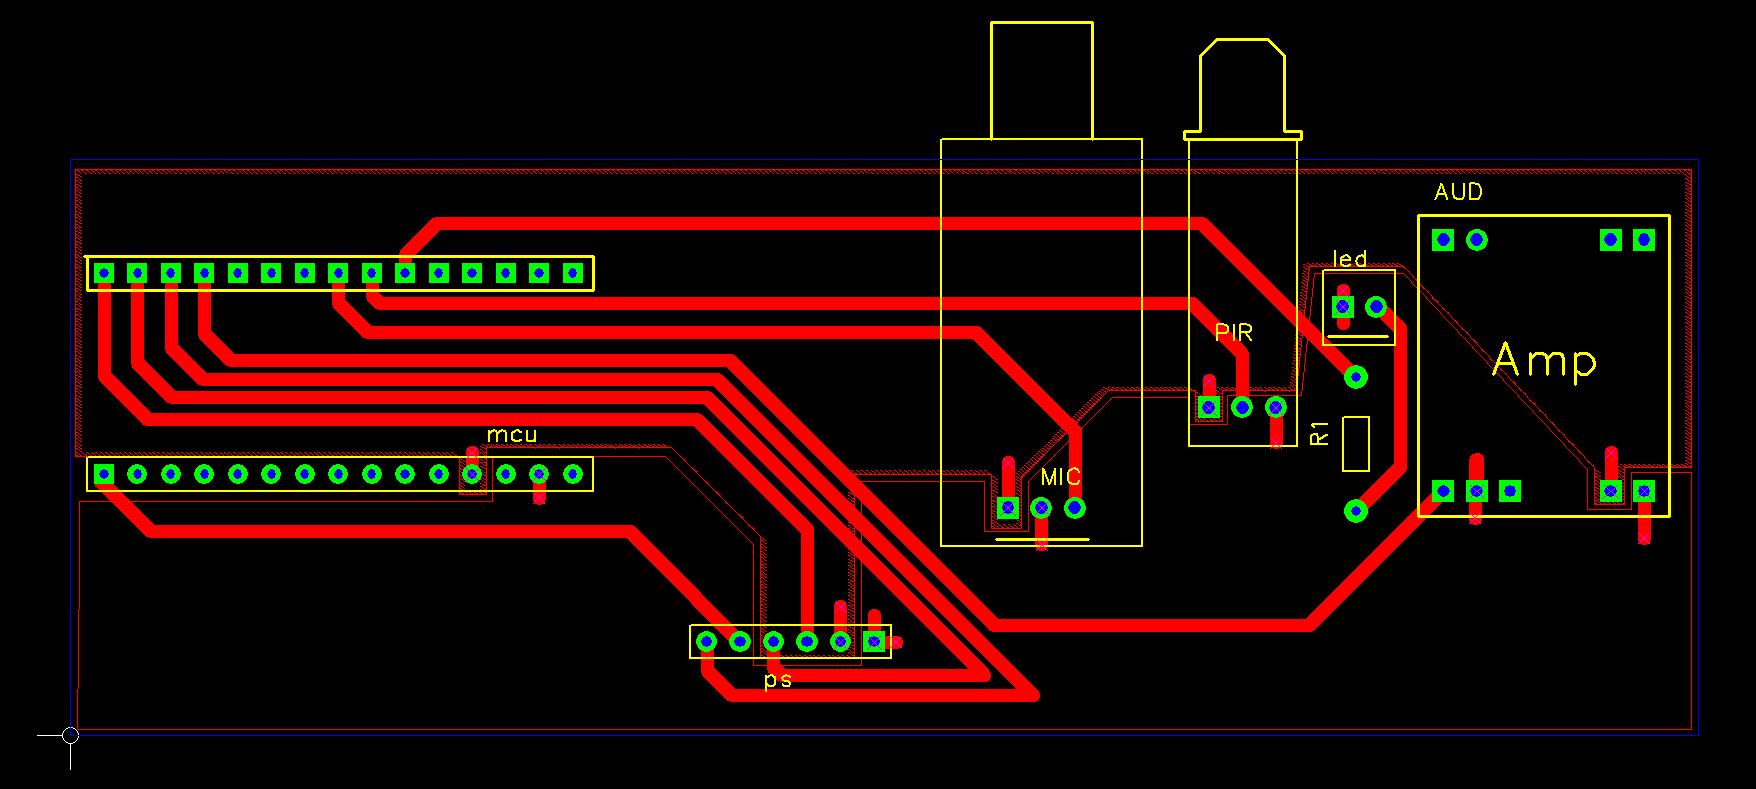 Pcb design x0hhcit4qp